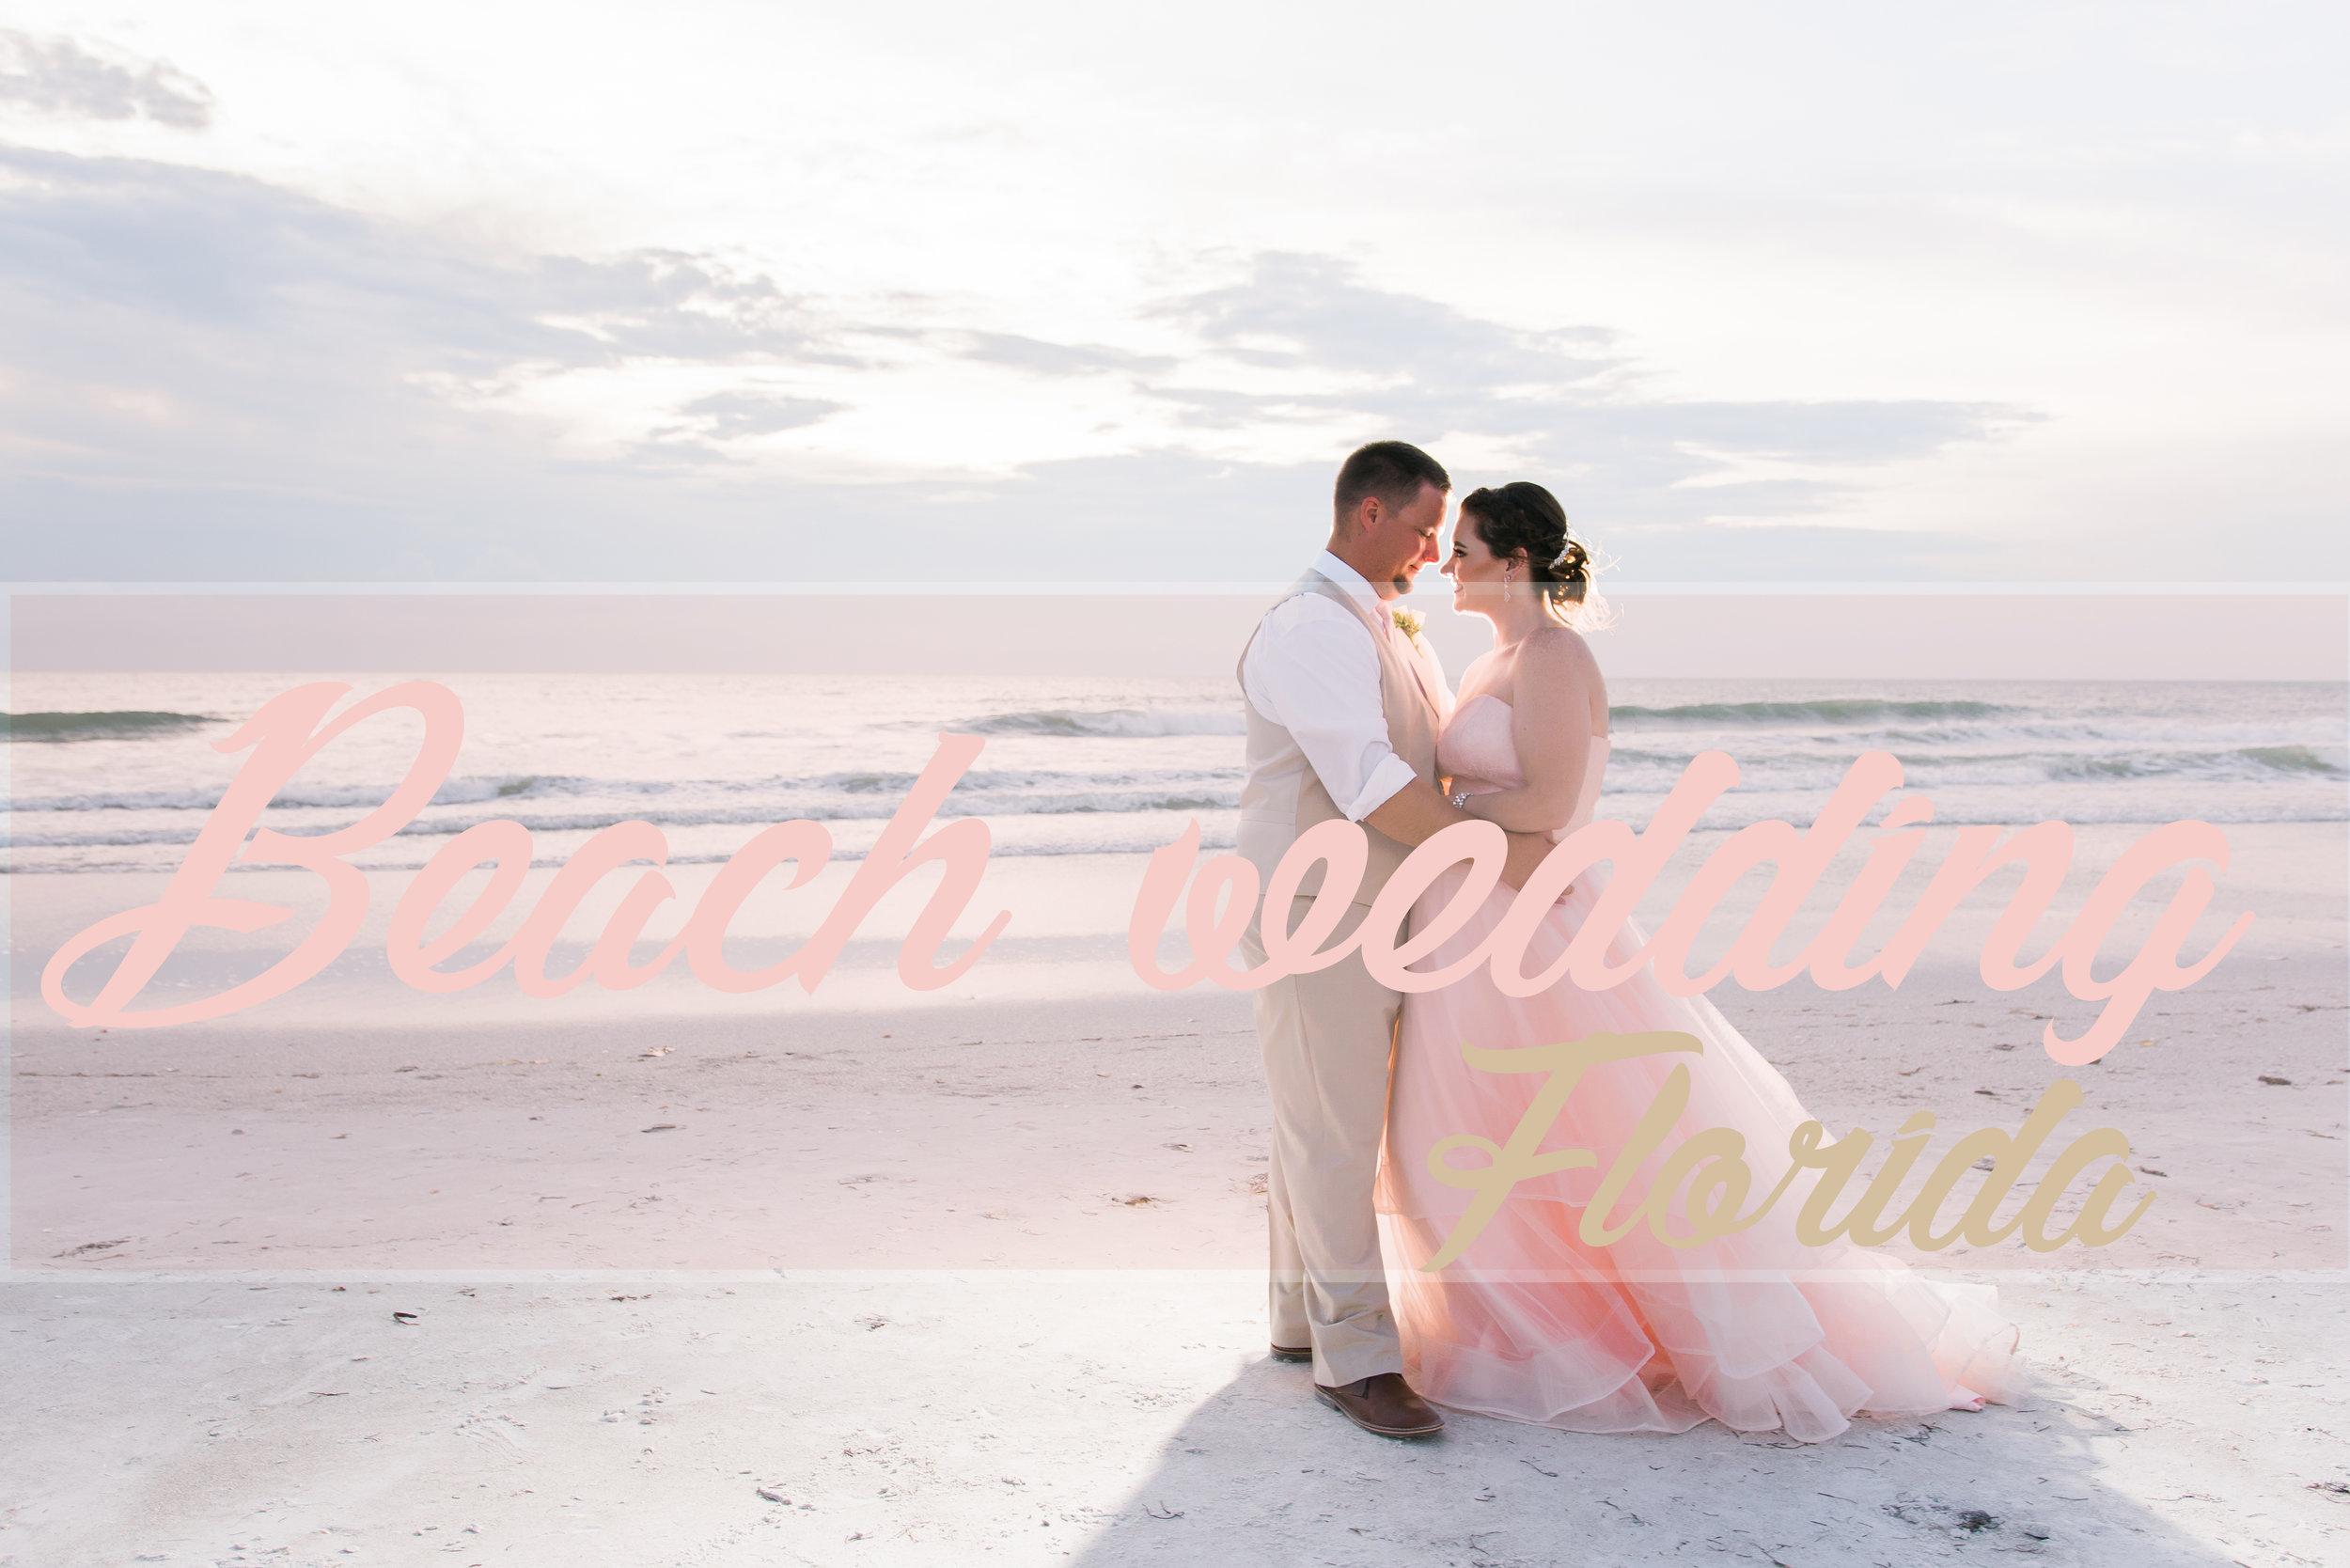 Florida-beach-wedding, The-Don-Cesar-wedding-day, Pink-wedding-dress